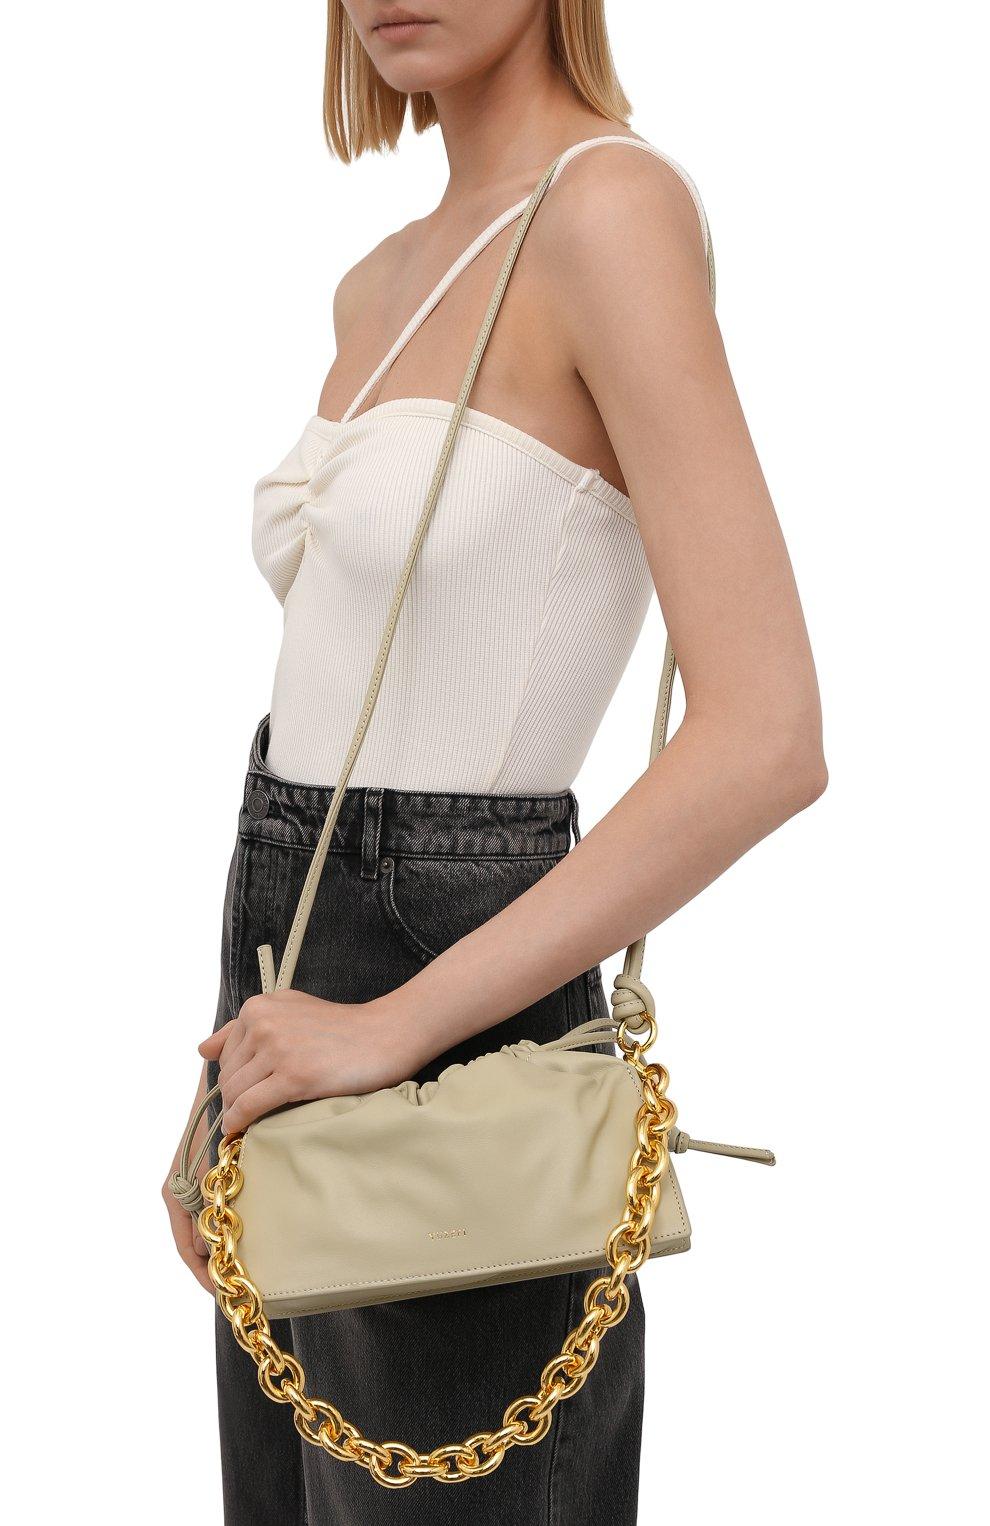 Женская сумка bom YUZEFI светло-зеленого цвета, арт. YUZIC0-HB-B0-13 | Фото 5 (Сумки-технические: Сумки top-handle; Материал: Натуральная кожа; Ремень/цепочка: На ремешке; Размер: small)